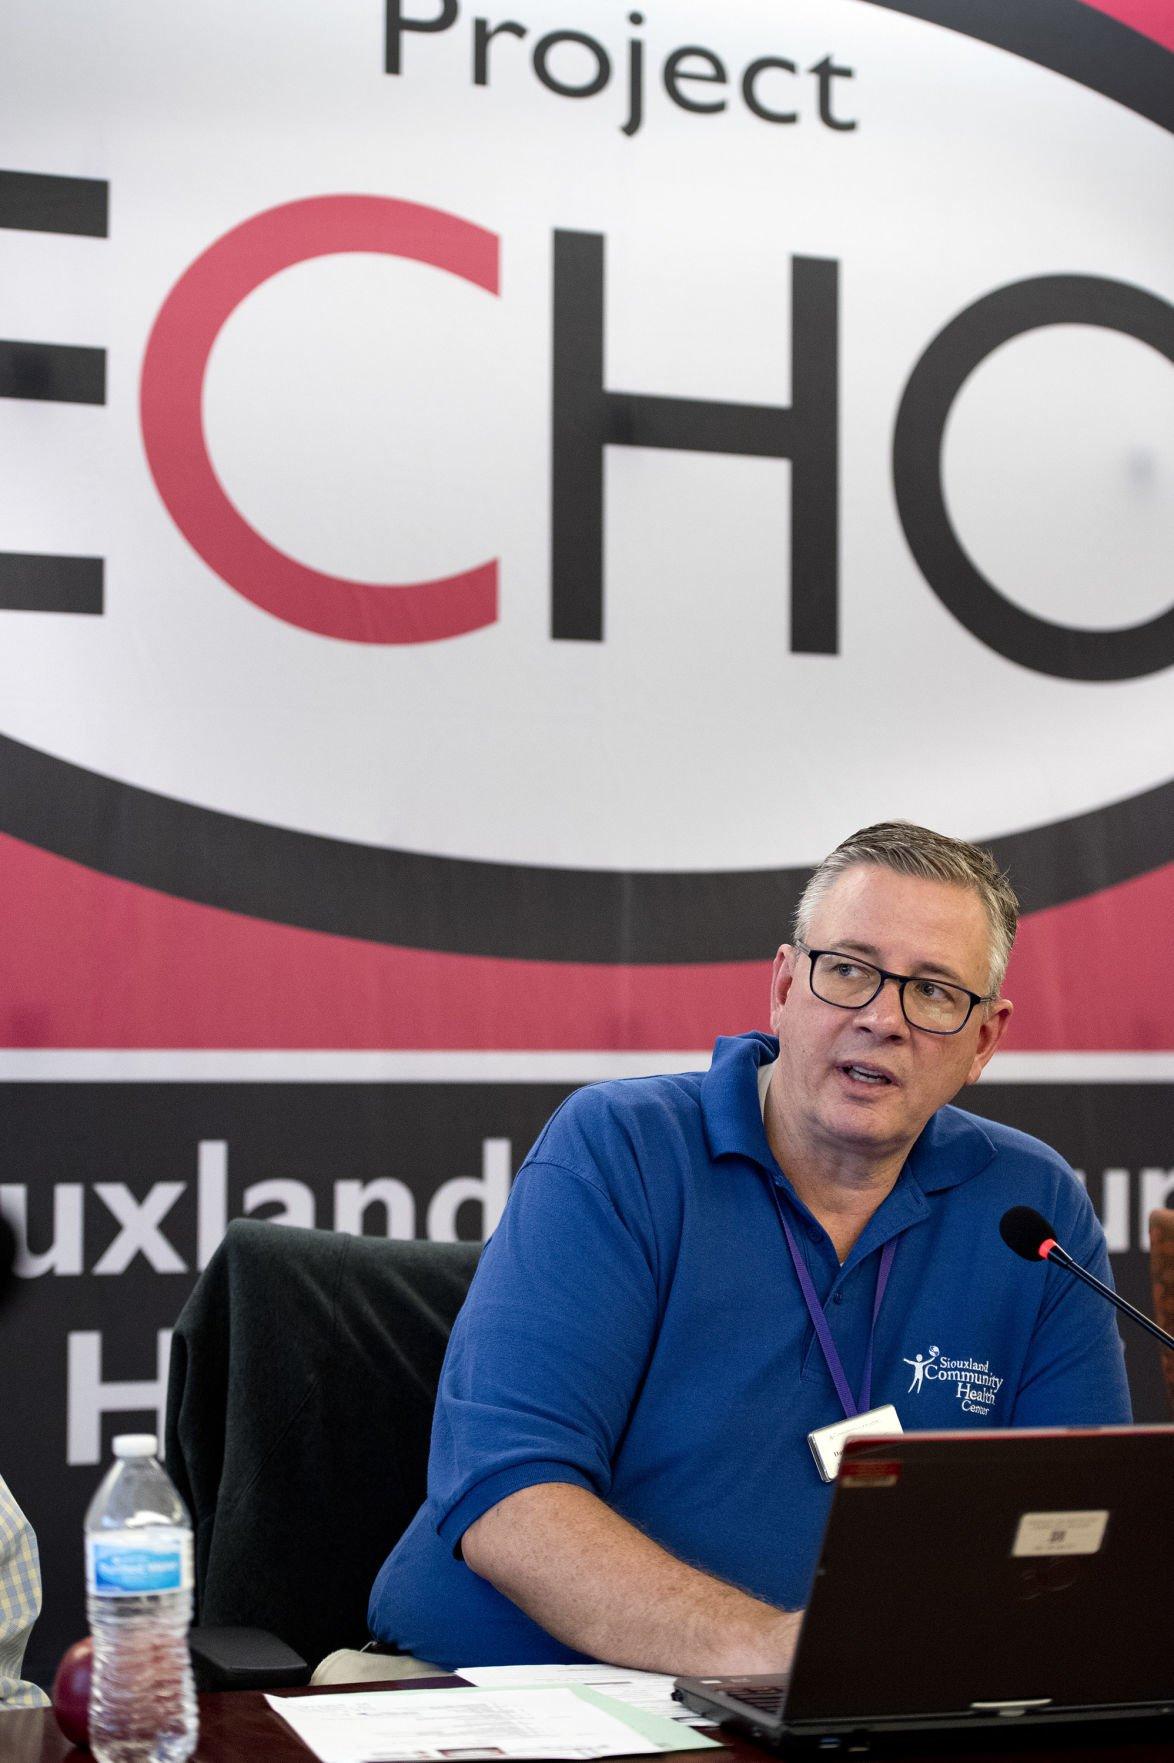 Health Project ECHO